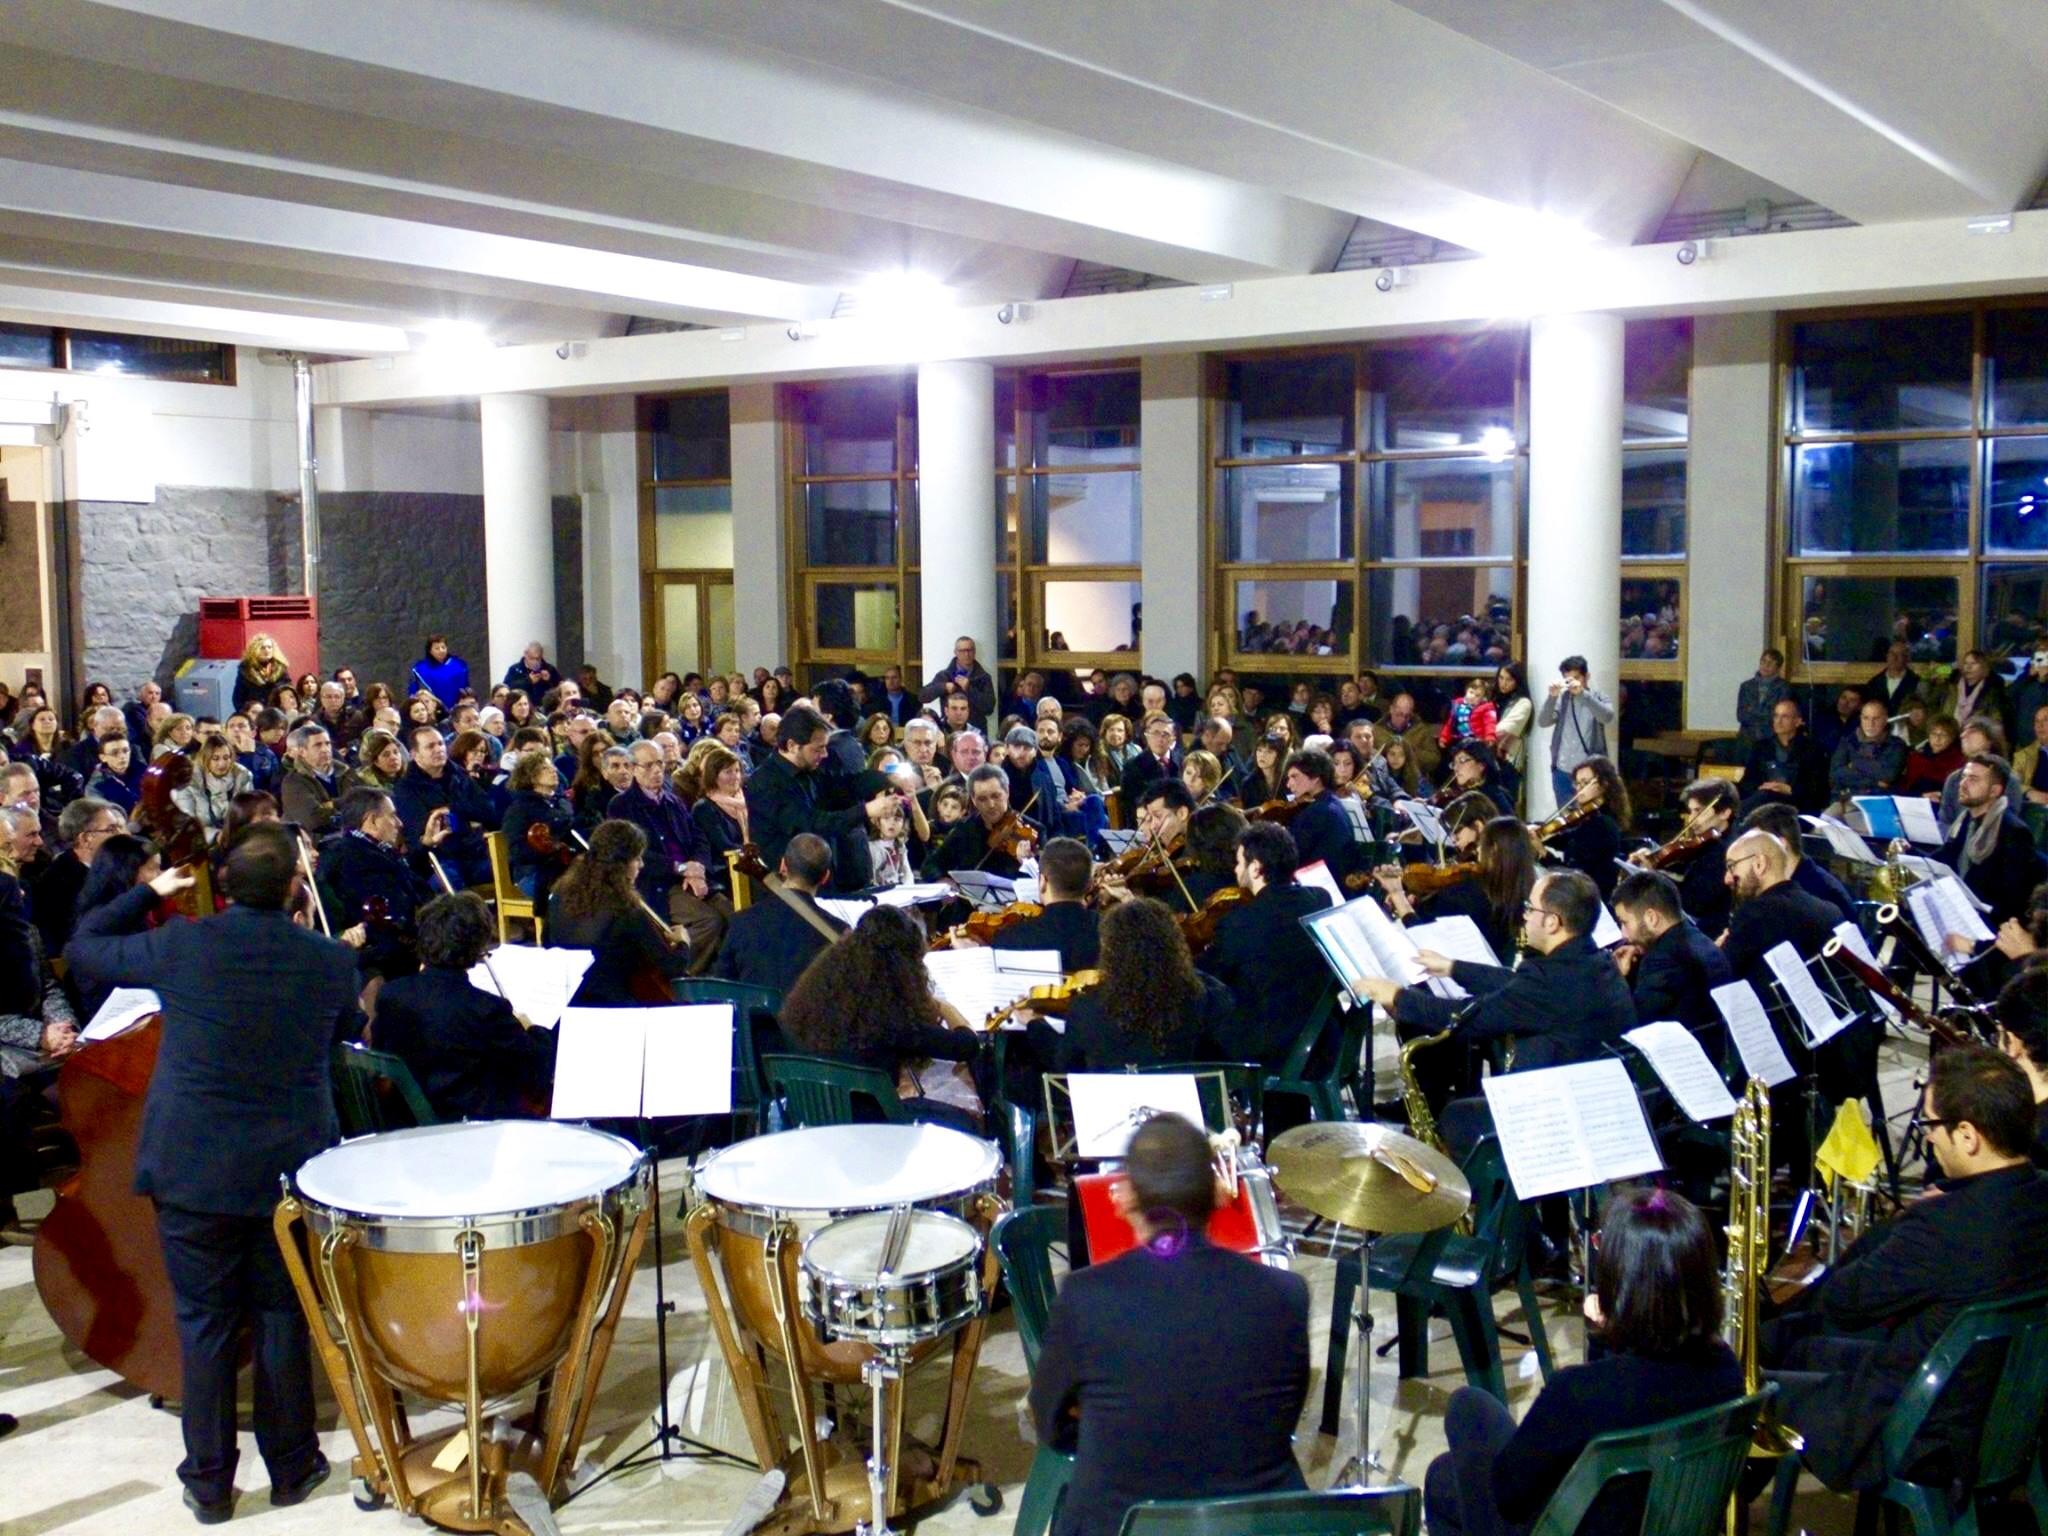 La Orquesta Filarmónica OSN de Mascalucía interpretando mi obra